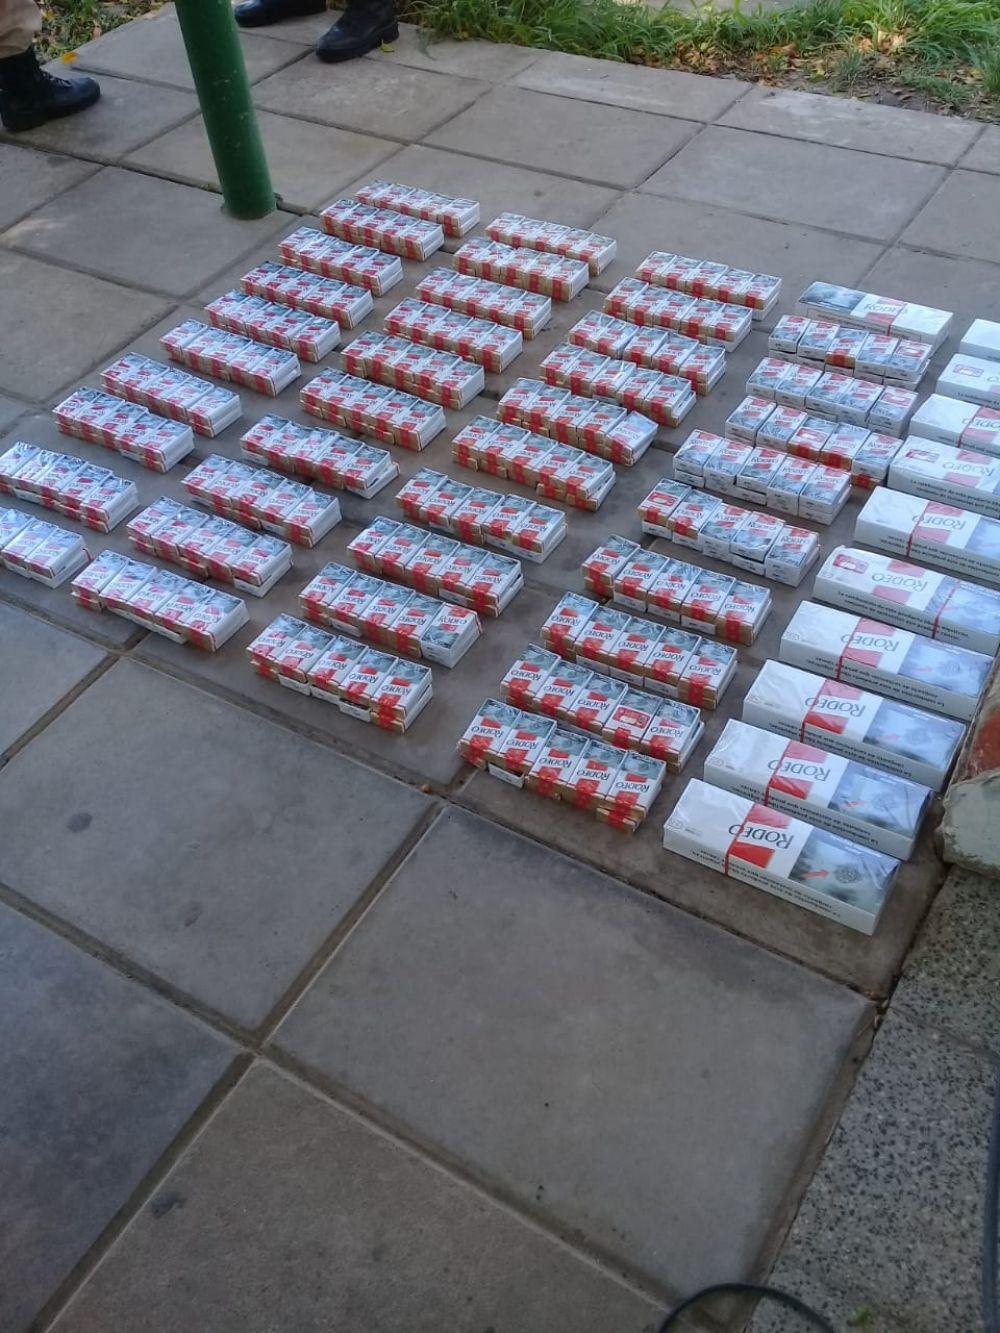 Ruta 12: secuestraron casi 400 paquetes de cigarrillos ilegales